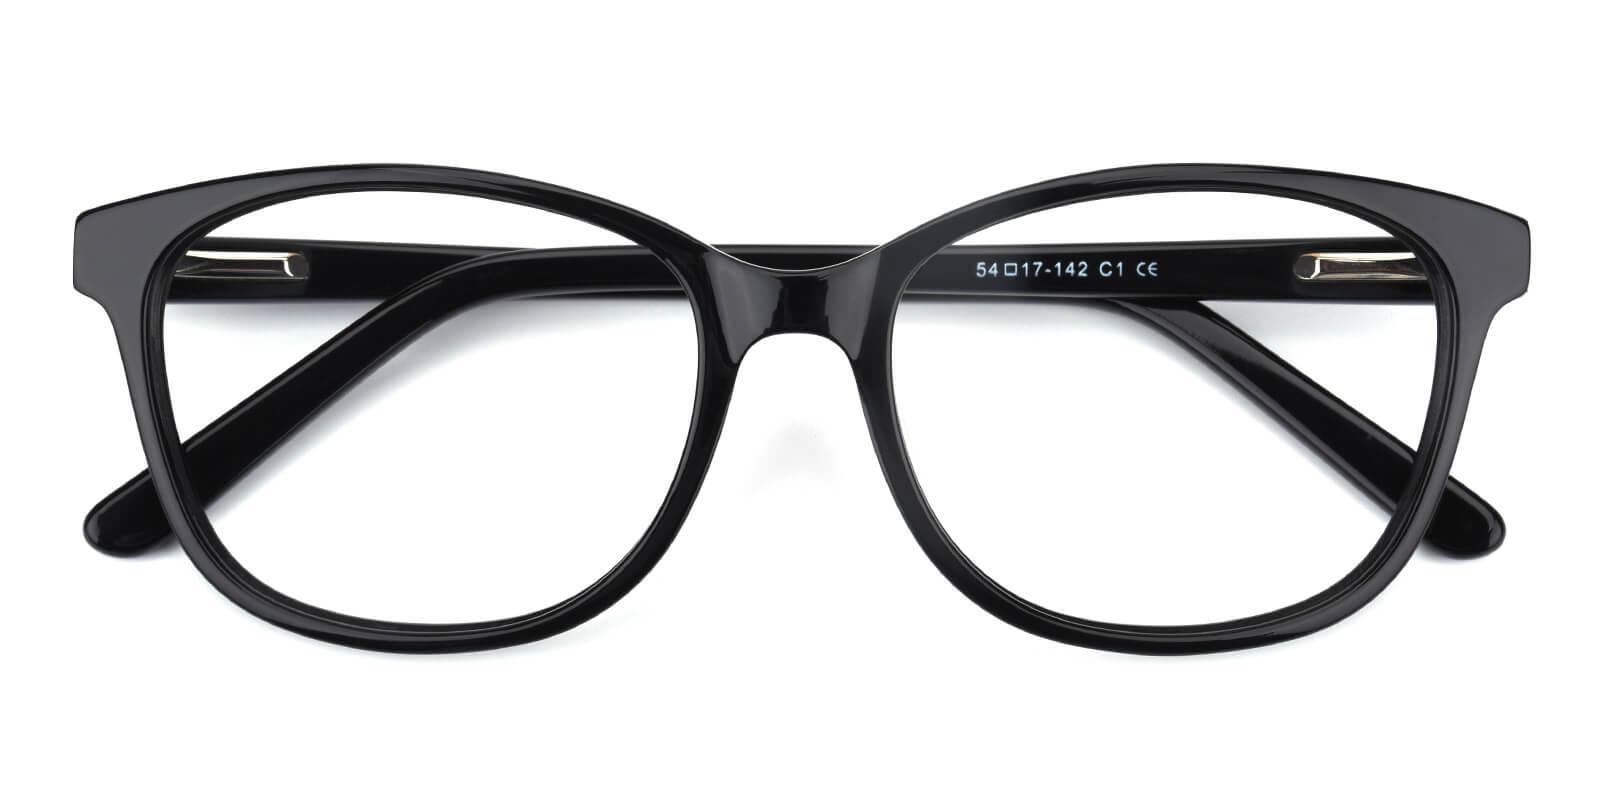 Bolivia-Black-Cat-Acetate-Eyeglasses-detail